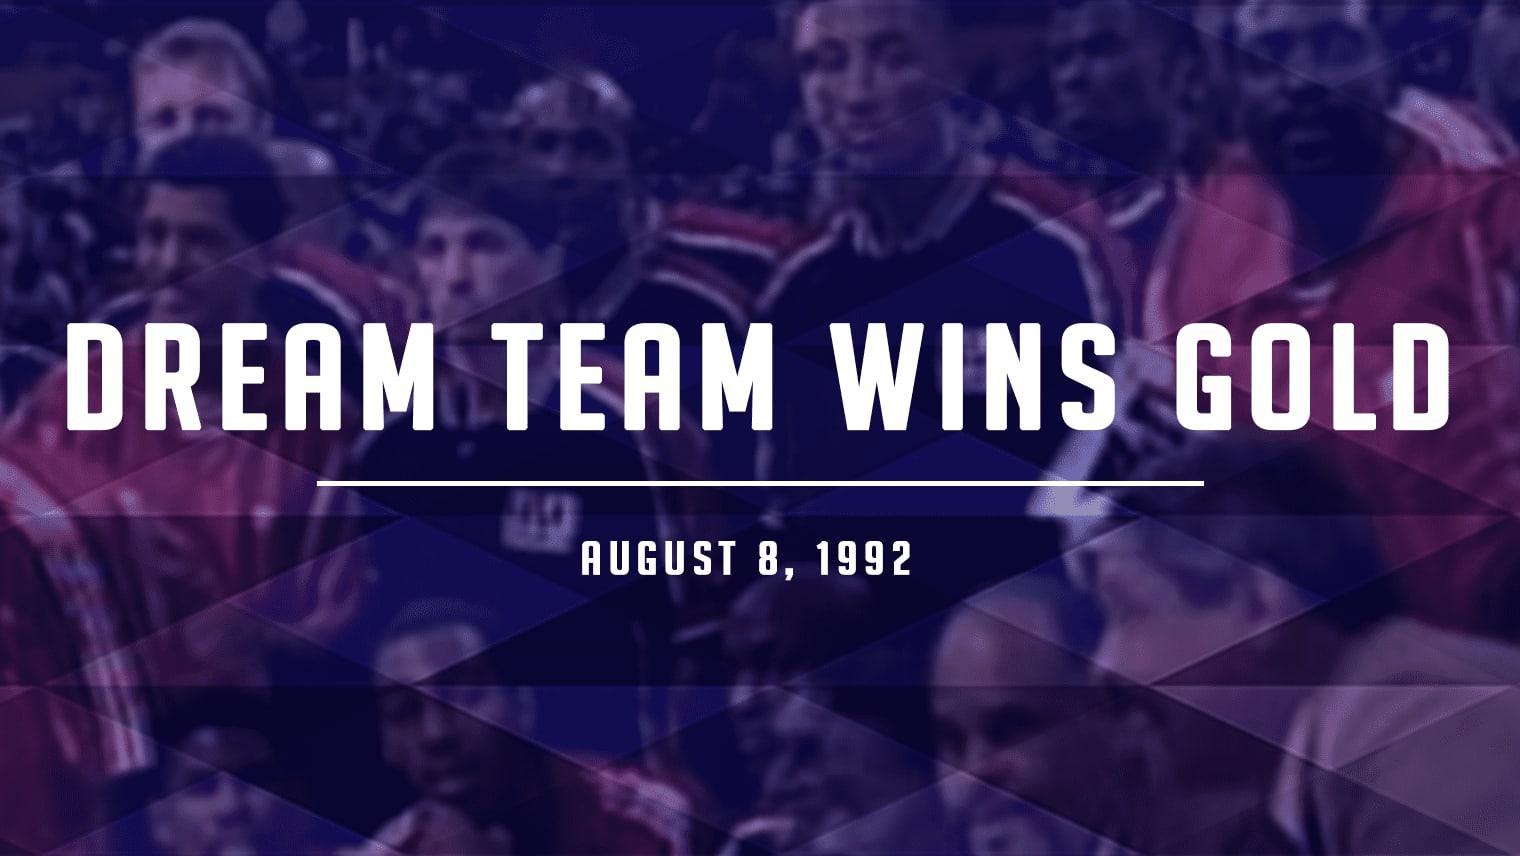 Dream Team Wins Gold in Barcelona